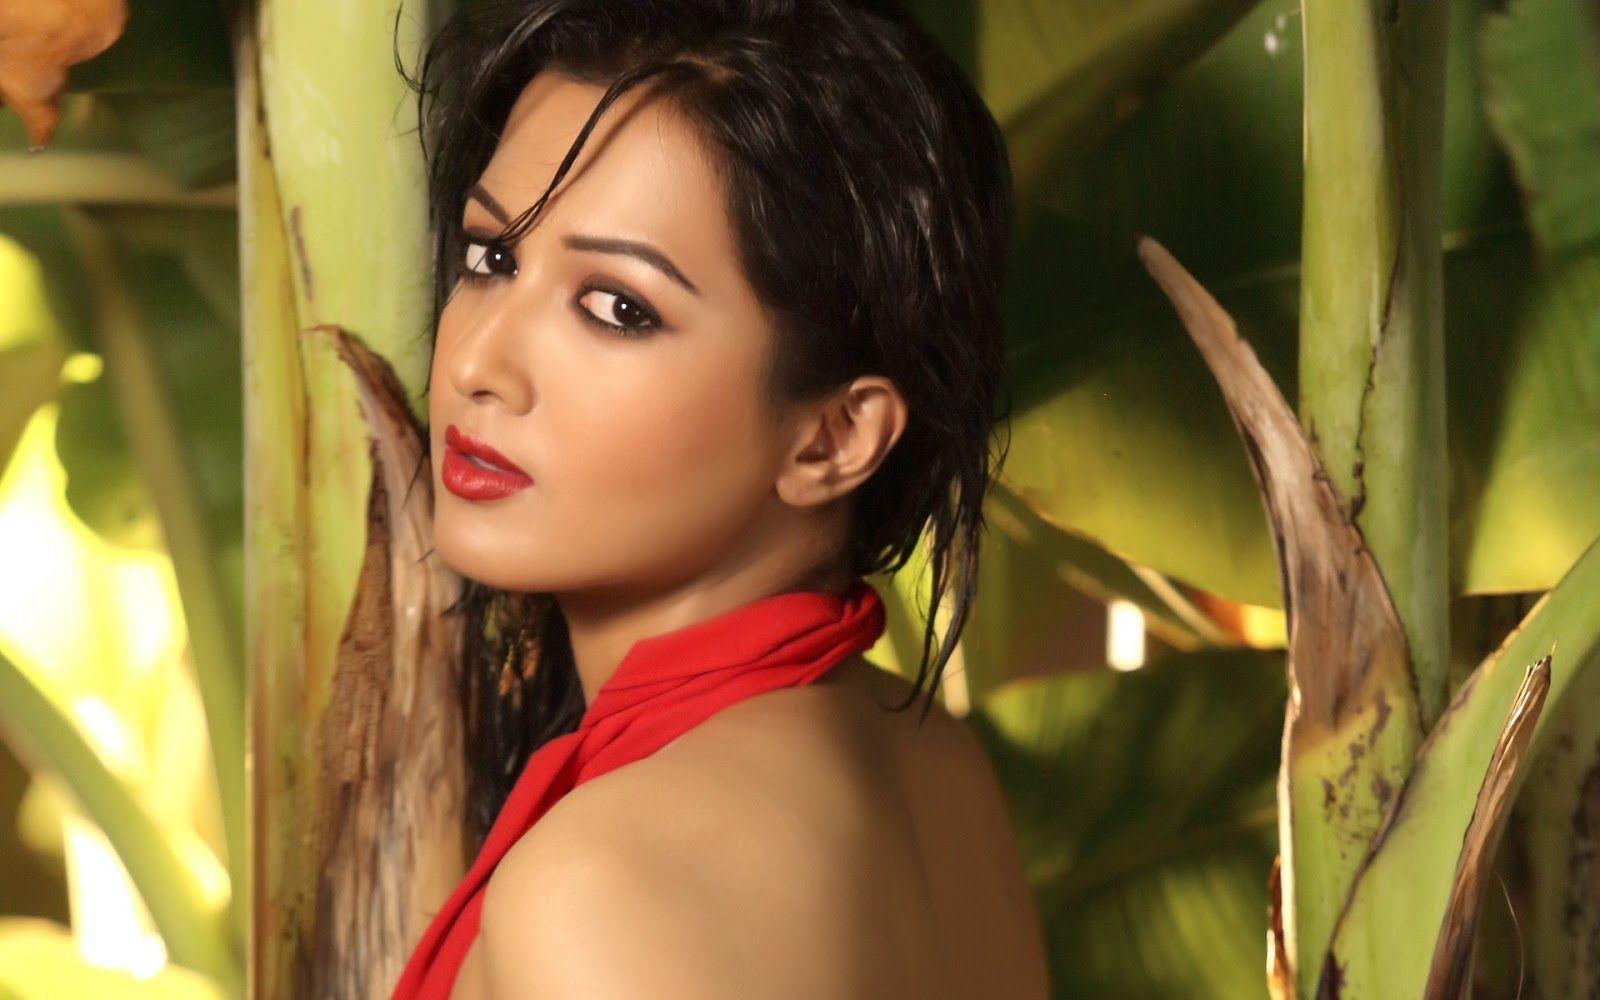 Free Download South Indian Actress Anushka Shetty Wallpapers - All South Indian Actresses - HD Wallpaper